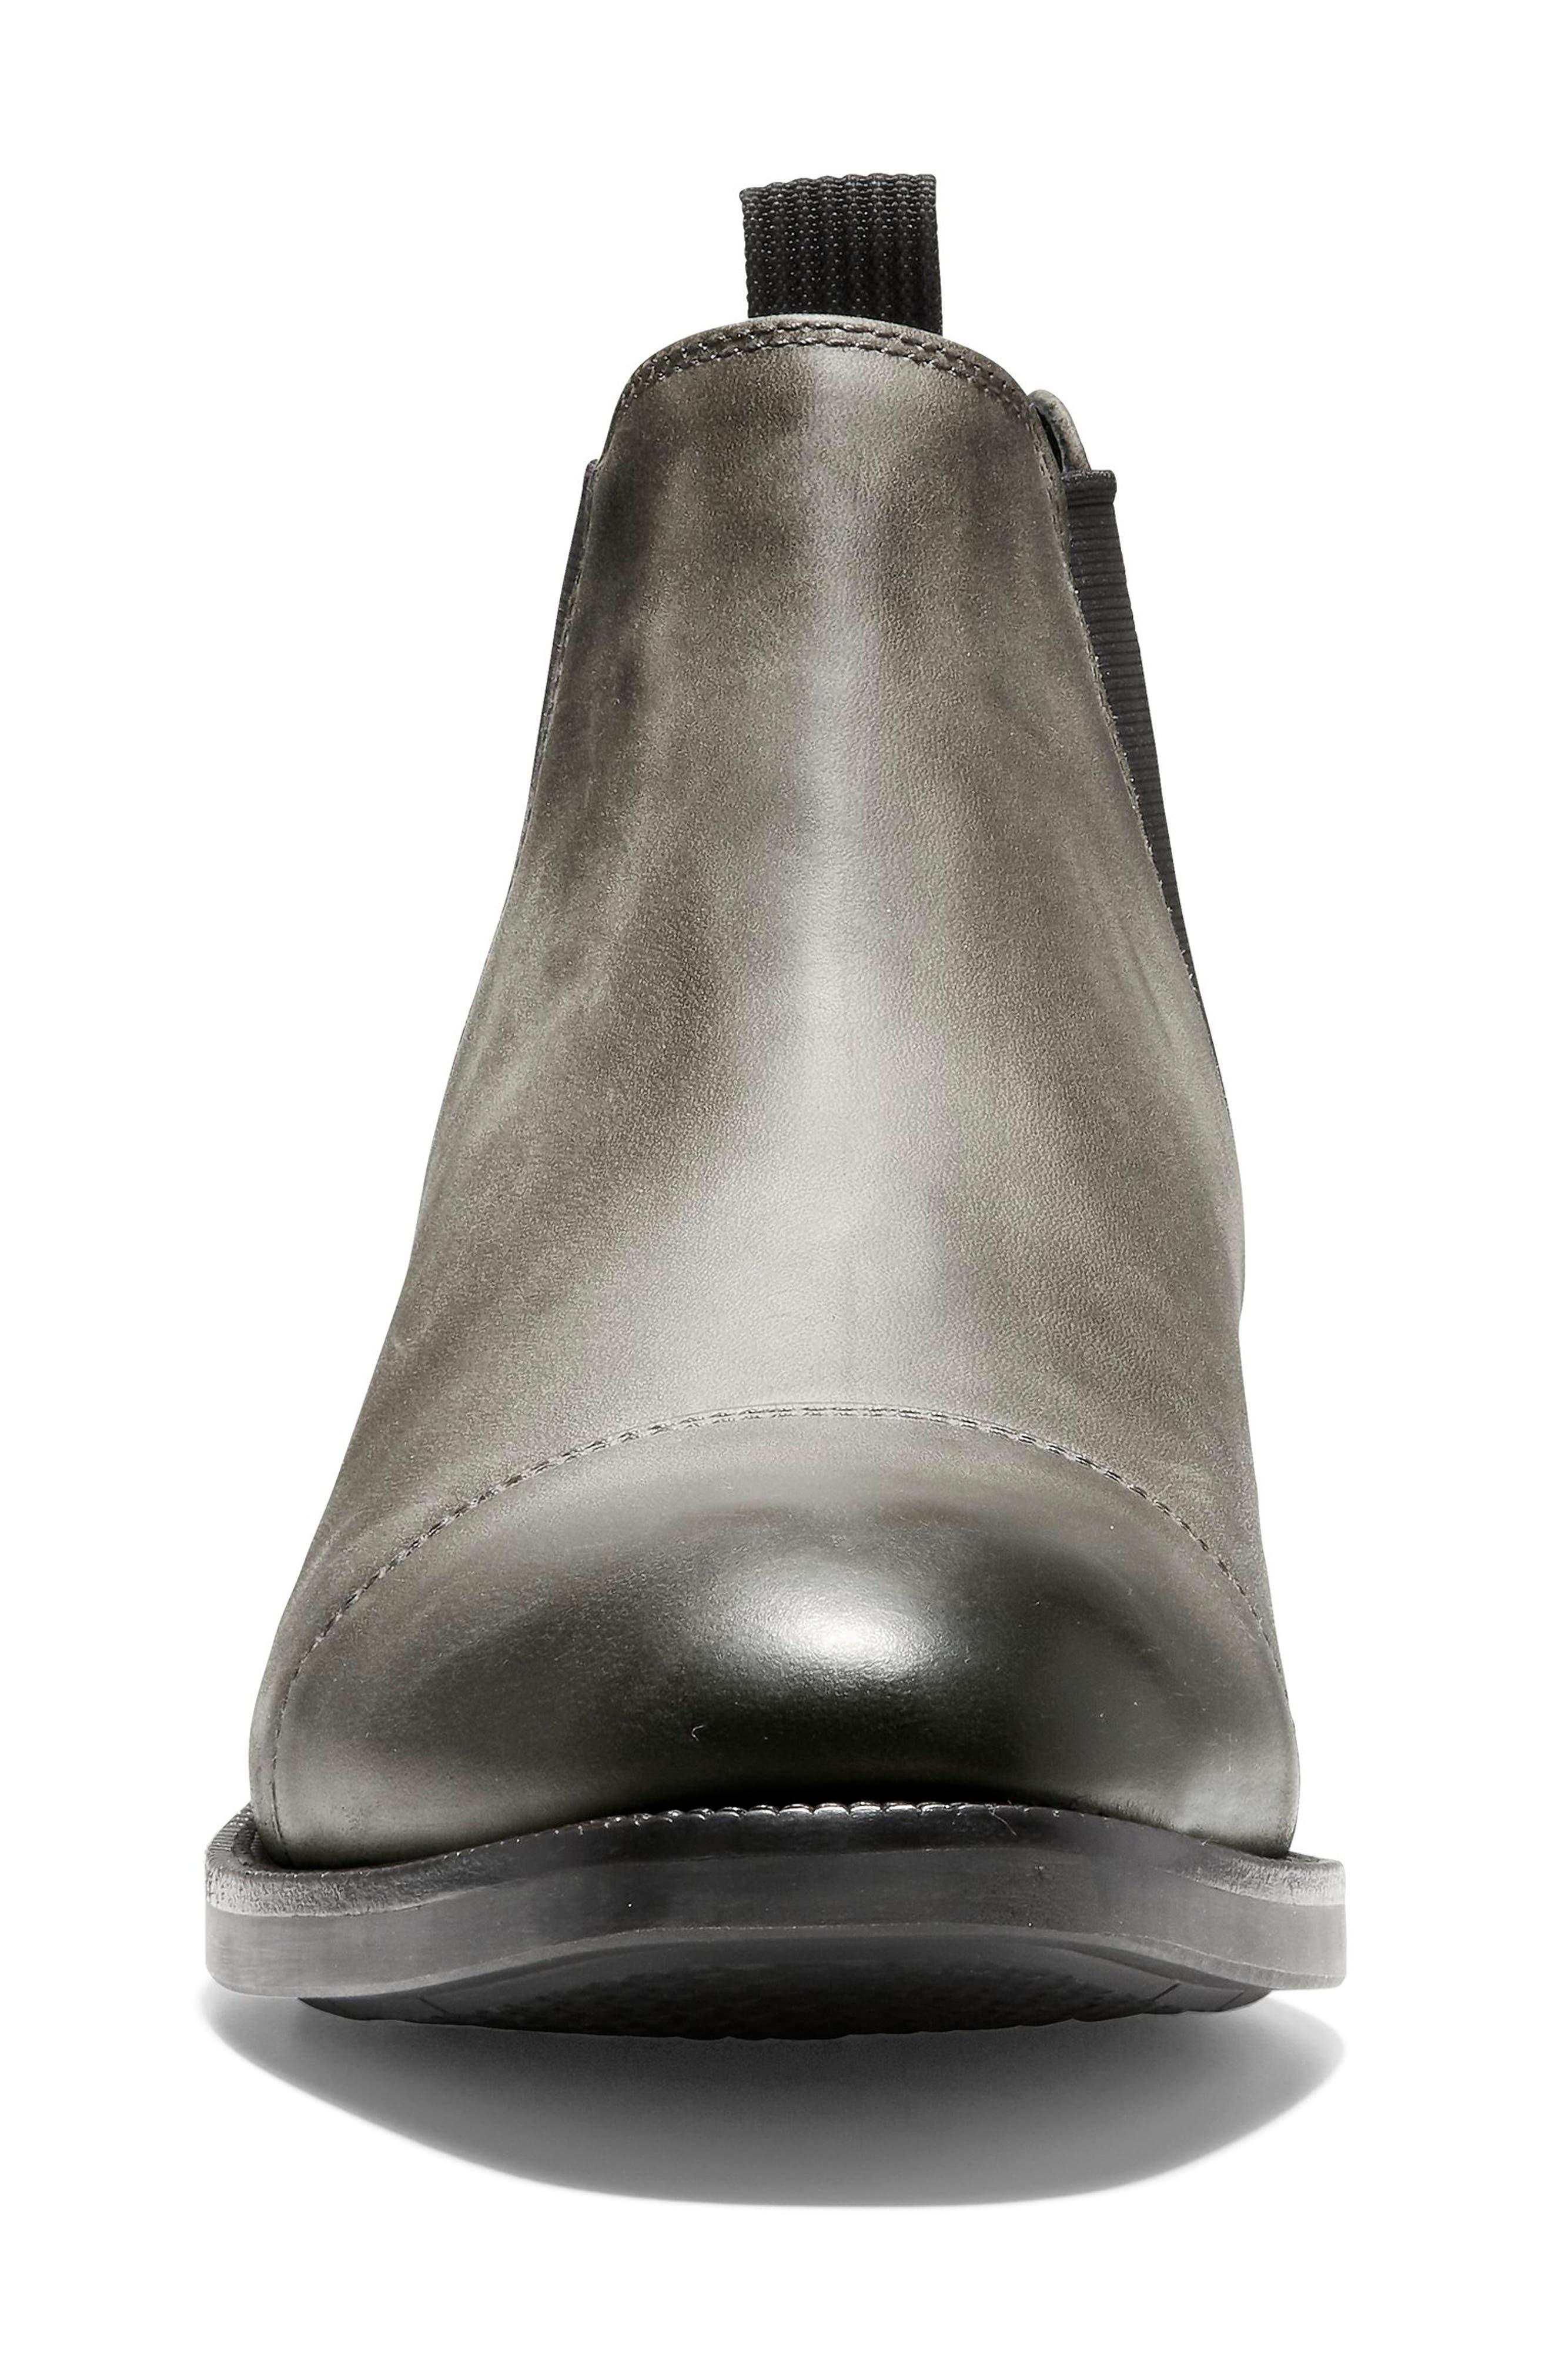 Wagner Grand Chelsea Boot,                             Alternate thumbnail 3, color,                             MIDNIGHT GREY NUBUCK